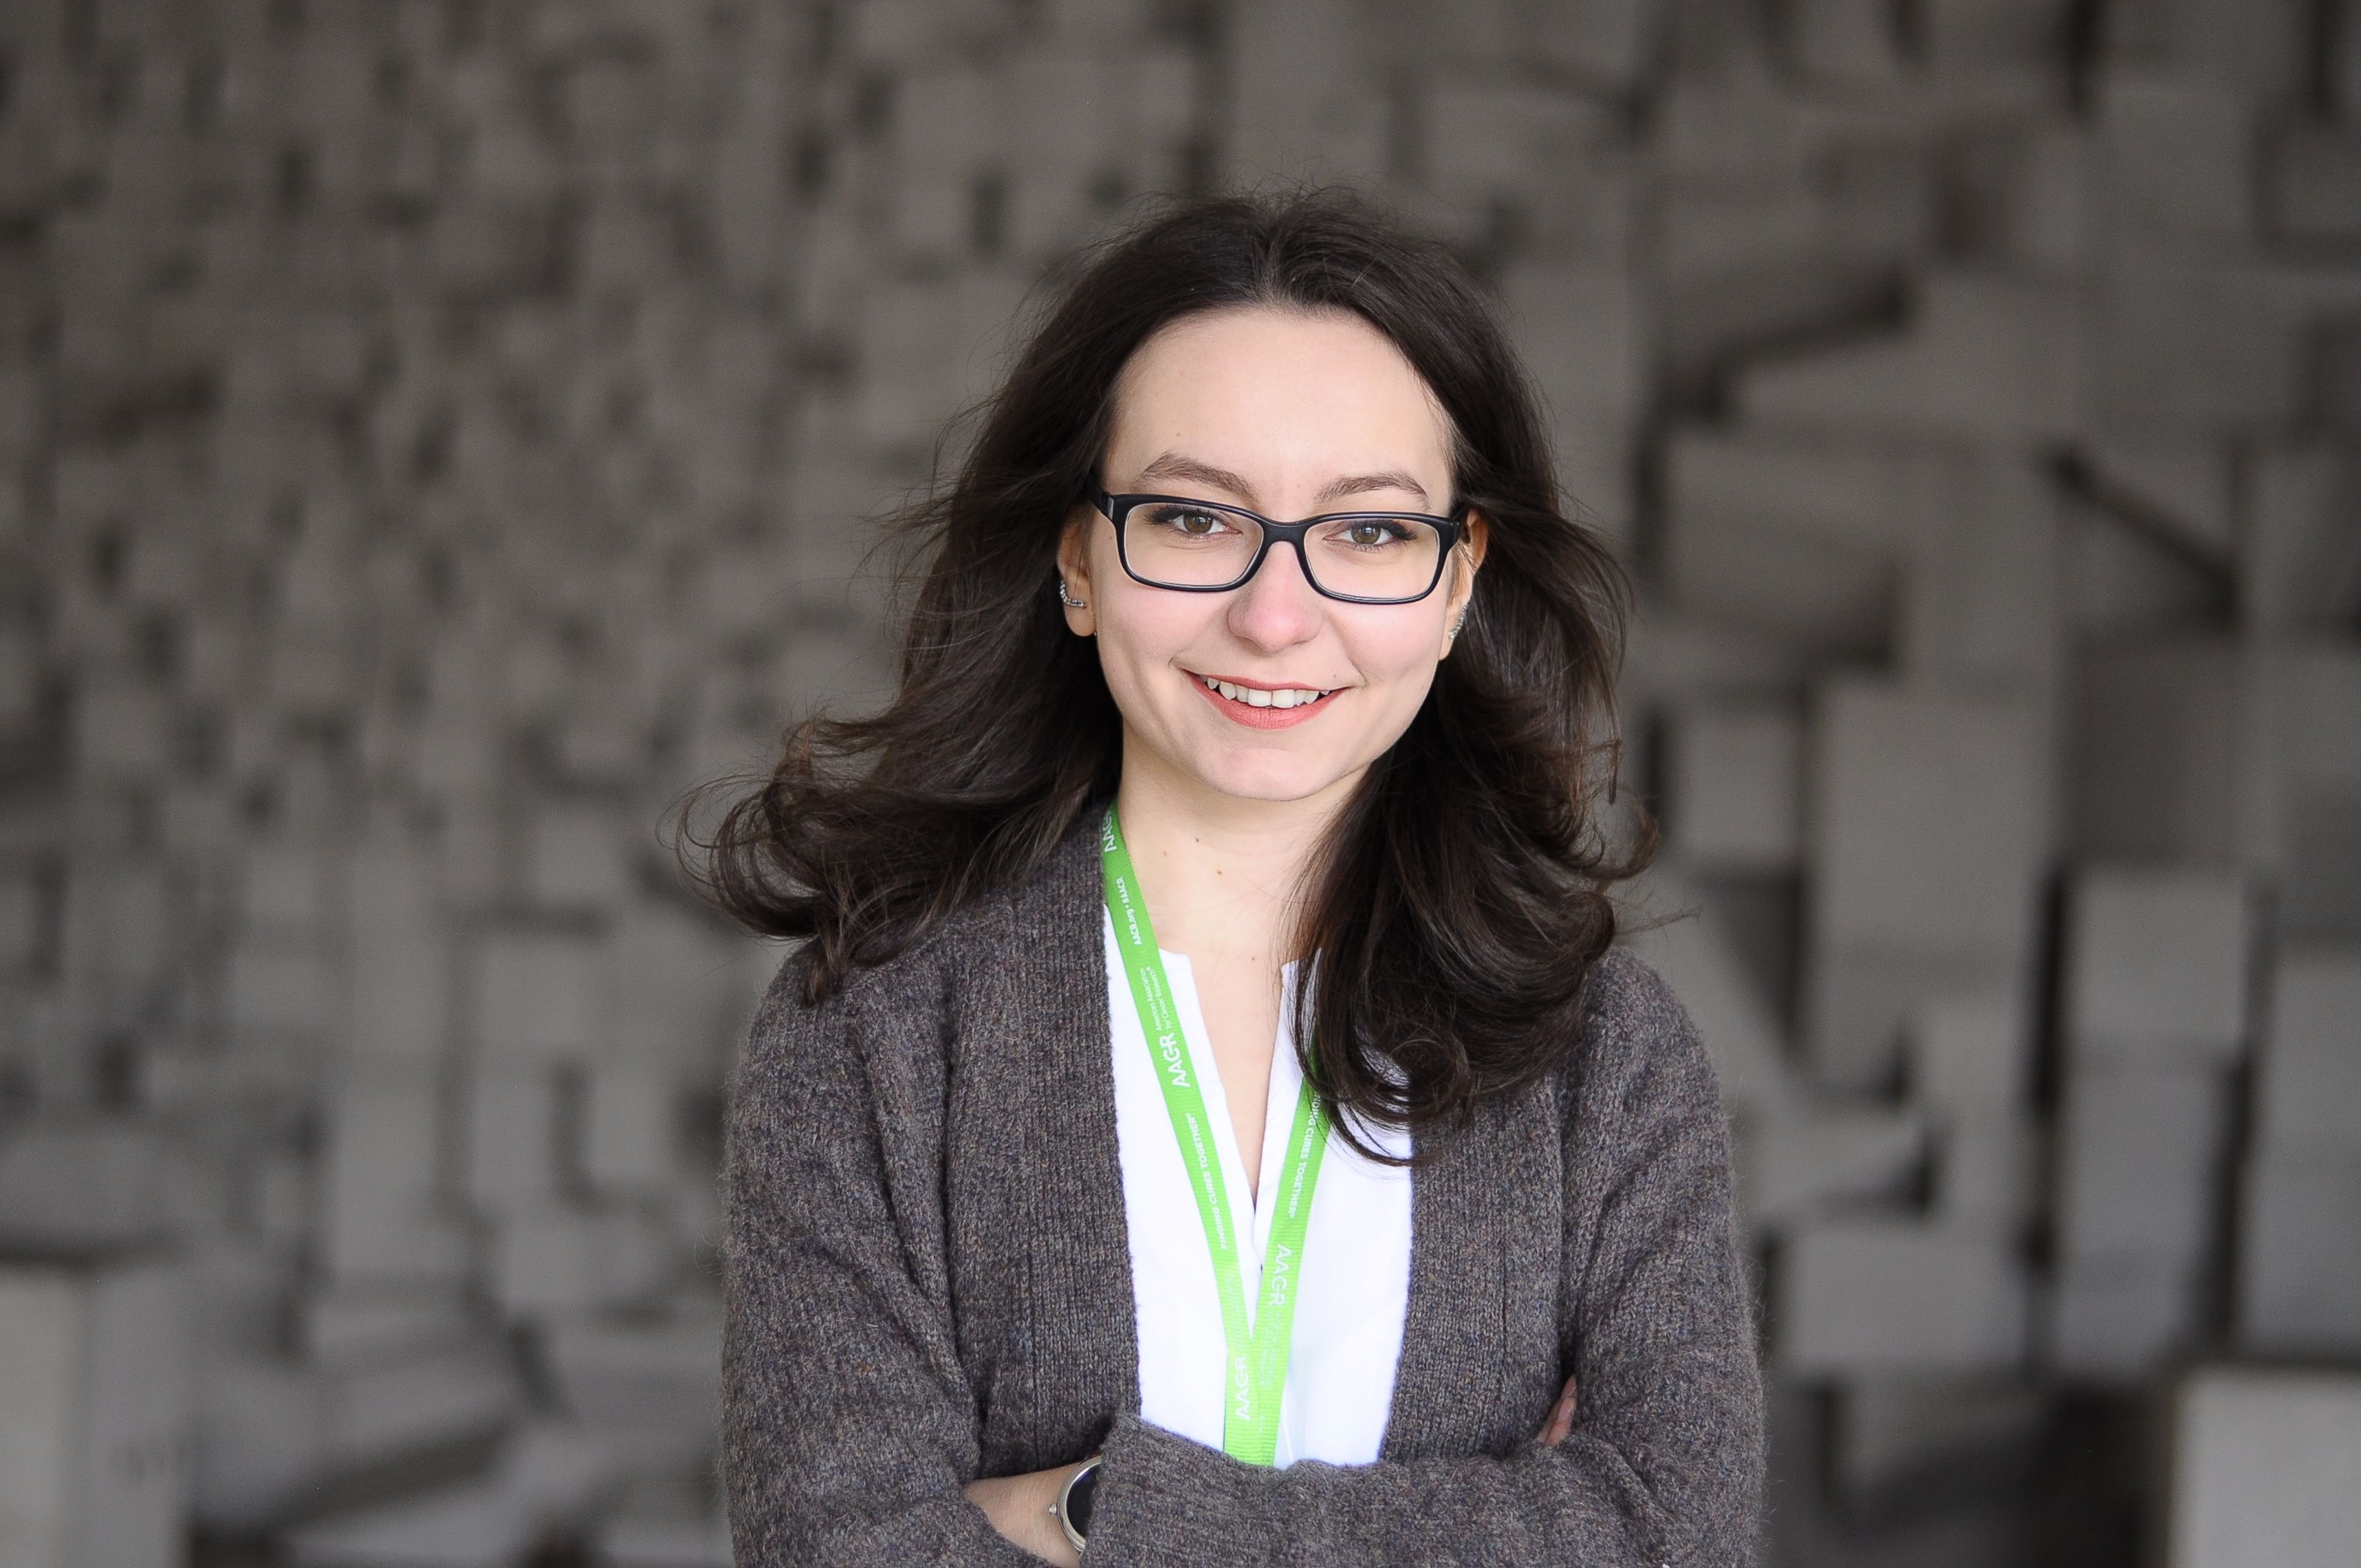 Ingrid Grozavu